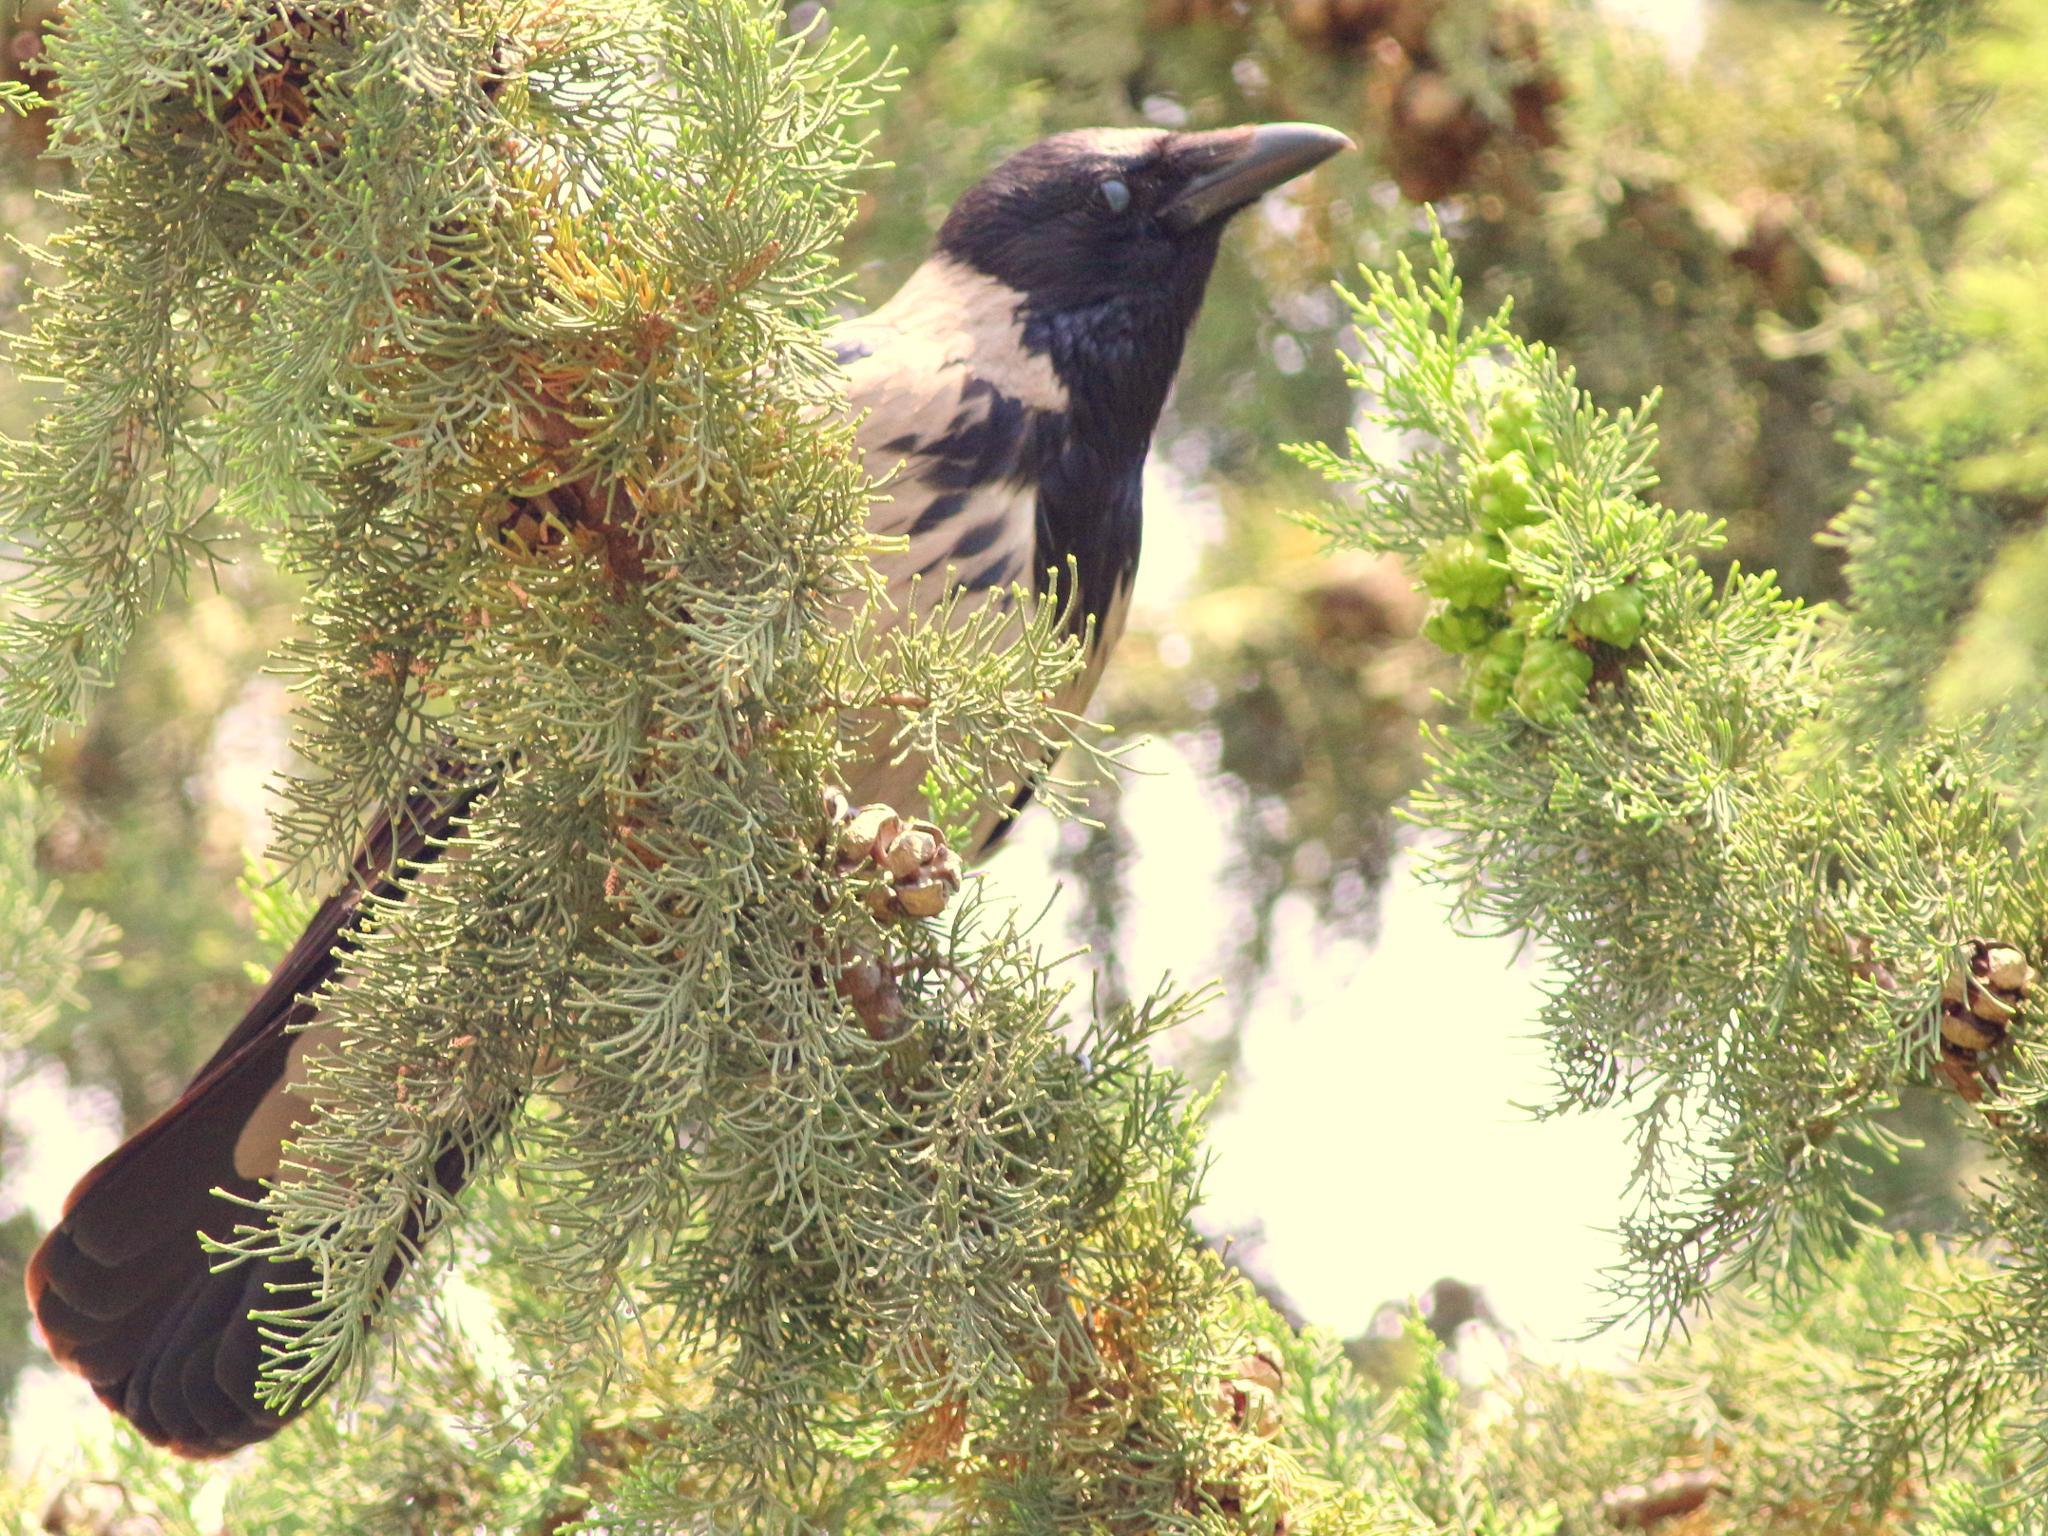 crow by Alp Emirhan Küpeli